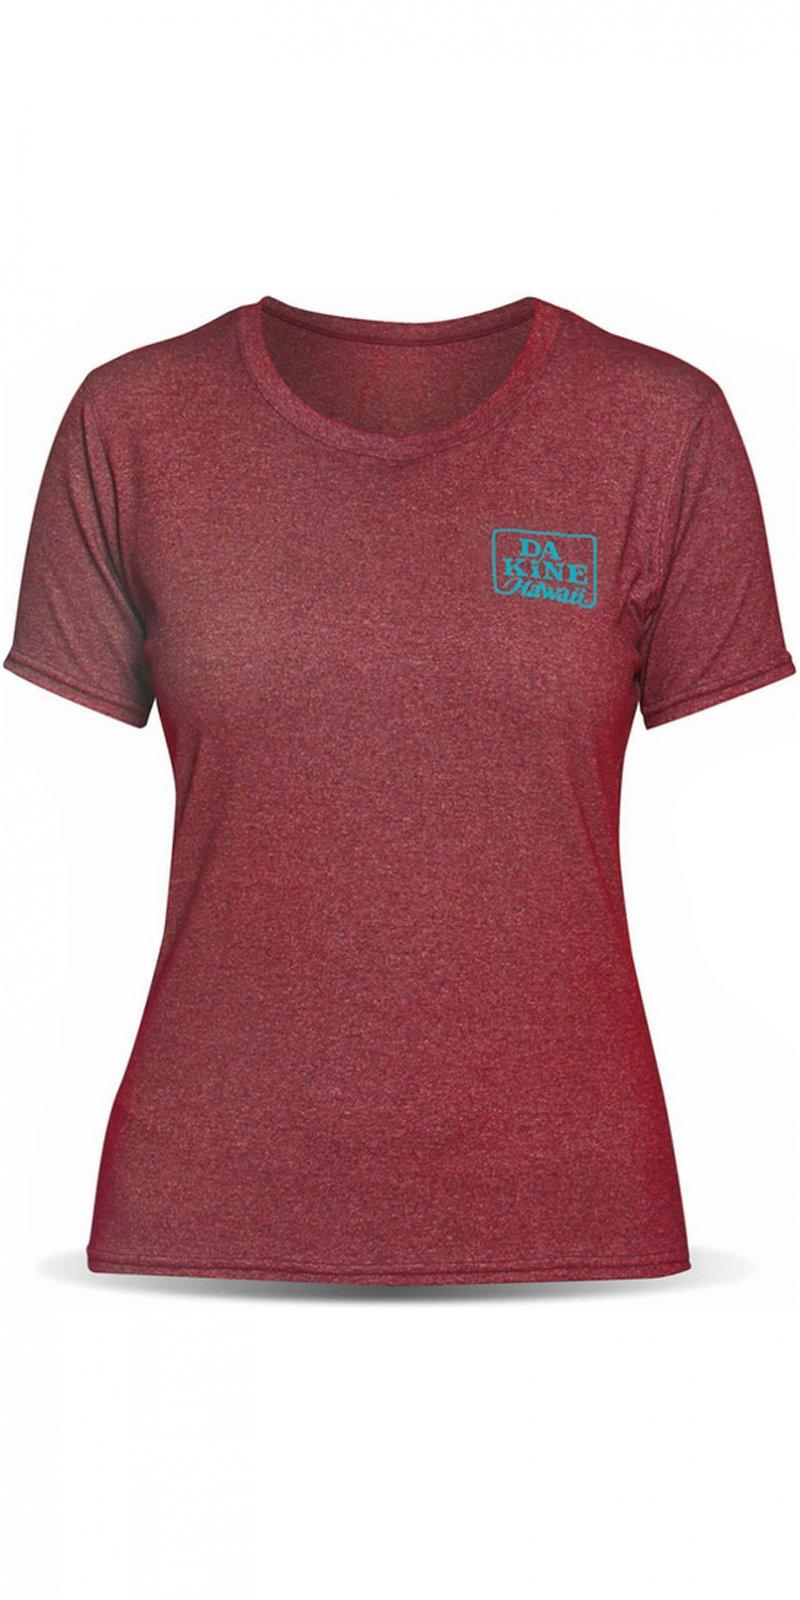 Dakine Dauntless Loose Fit Short Sleeve Shirt